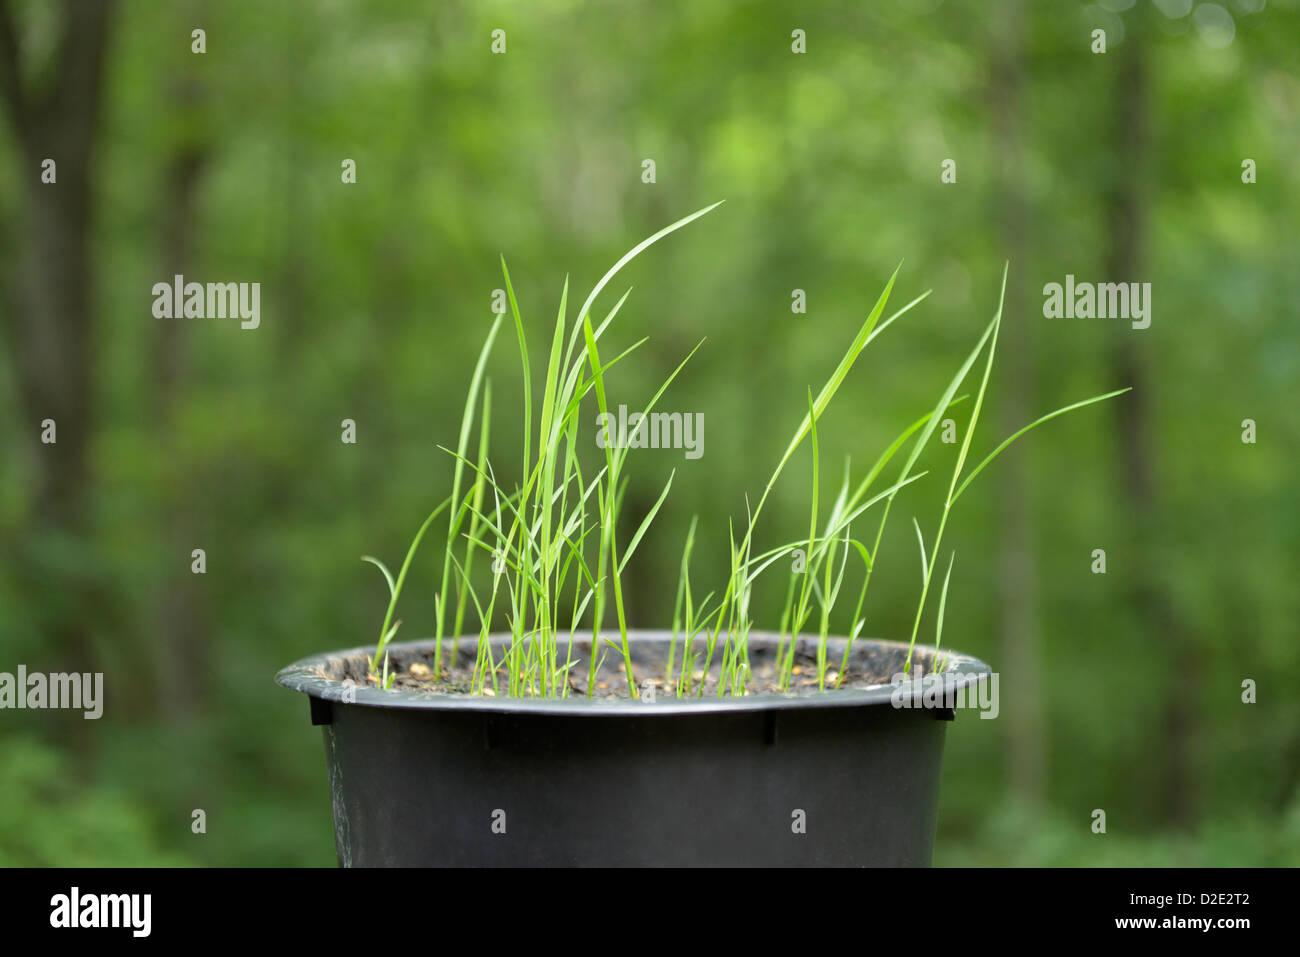 Rice seedlings.  Japanese Koshihkan variety, Oryza sativa - Stock Image